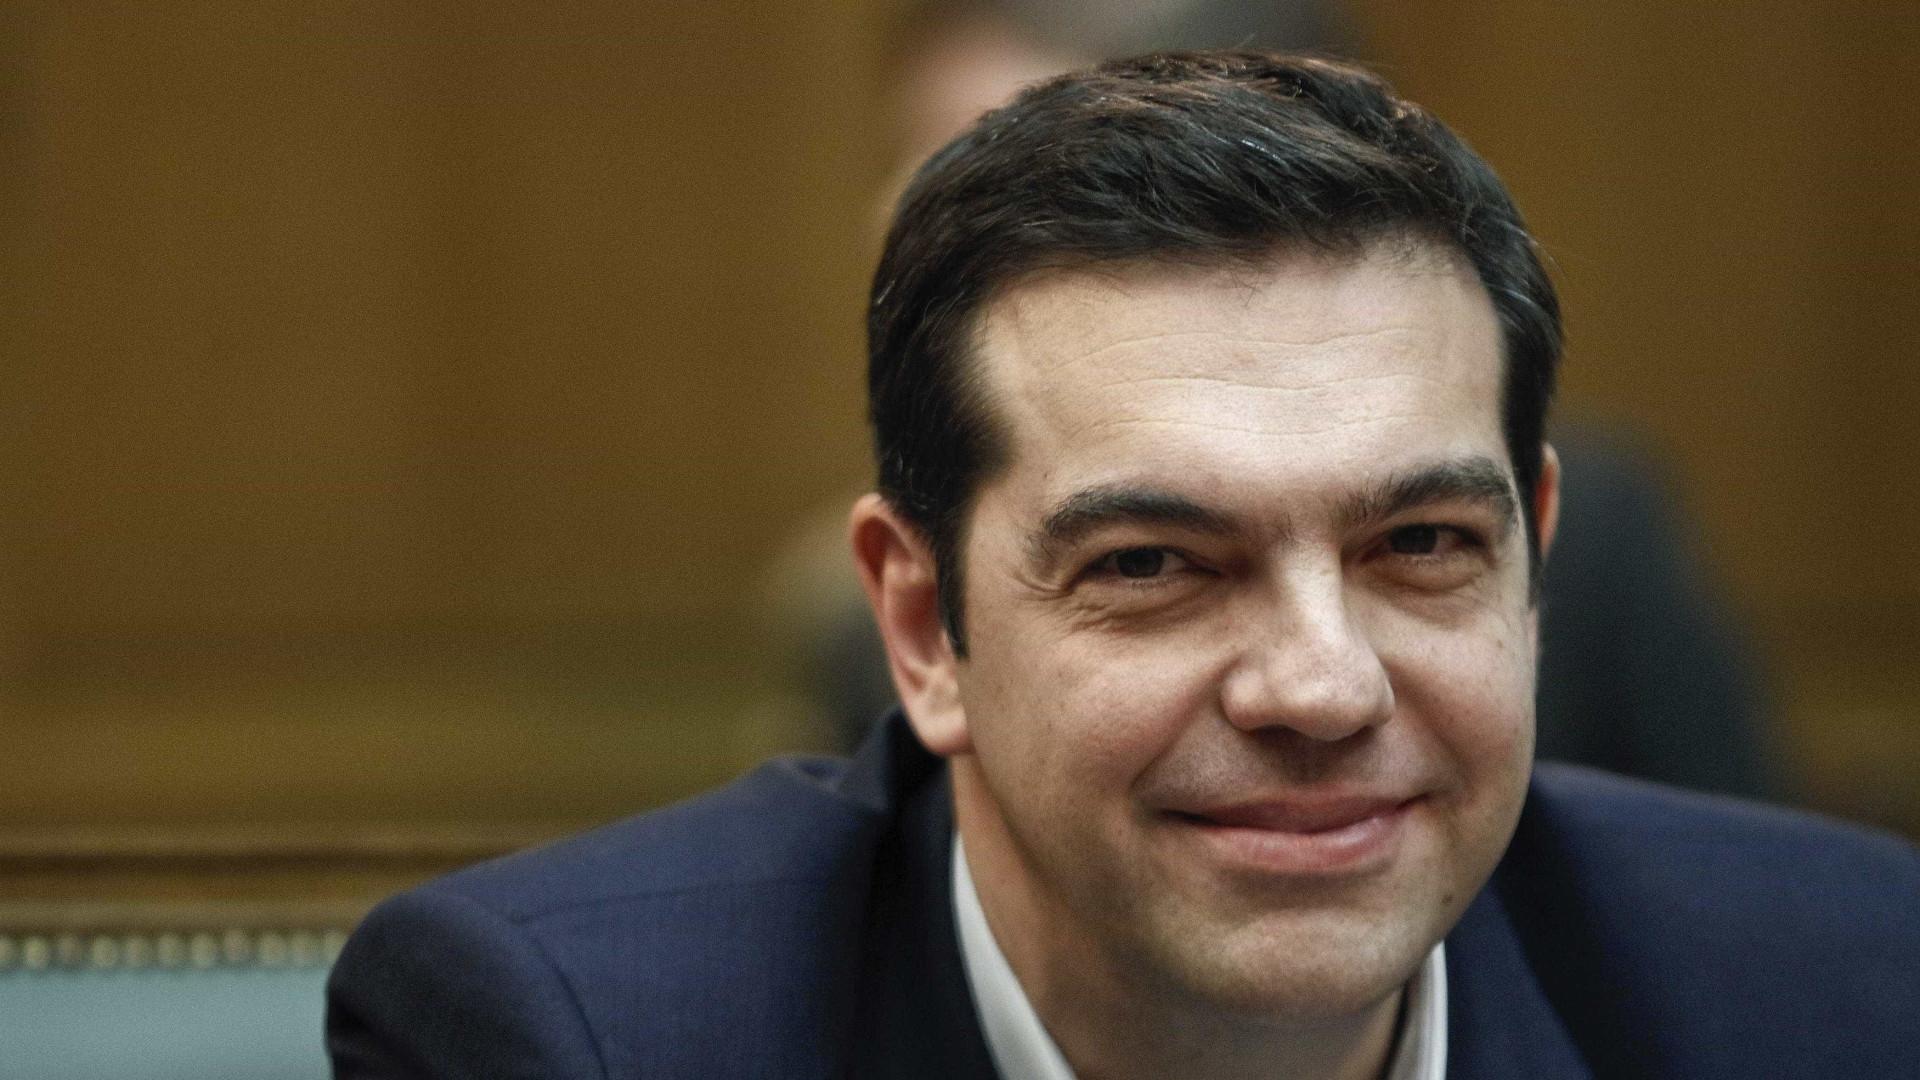 Primeiros-ministros grego e macedónio nomeados para o Nobel da Paz